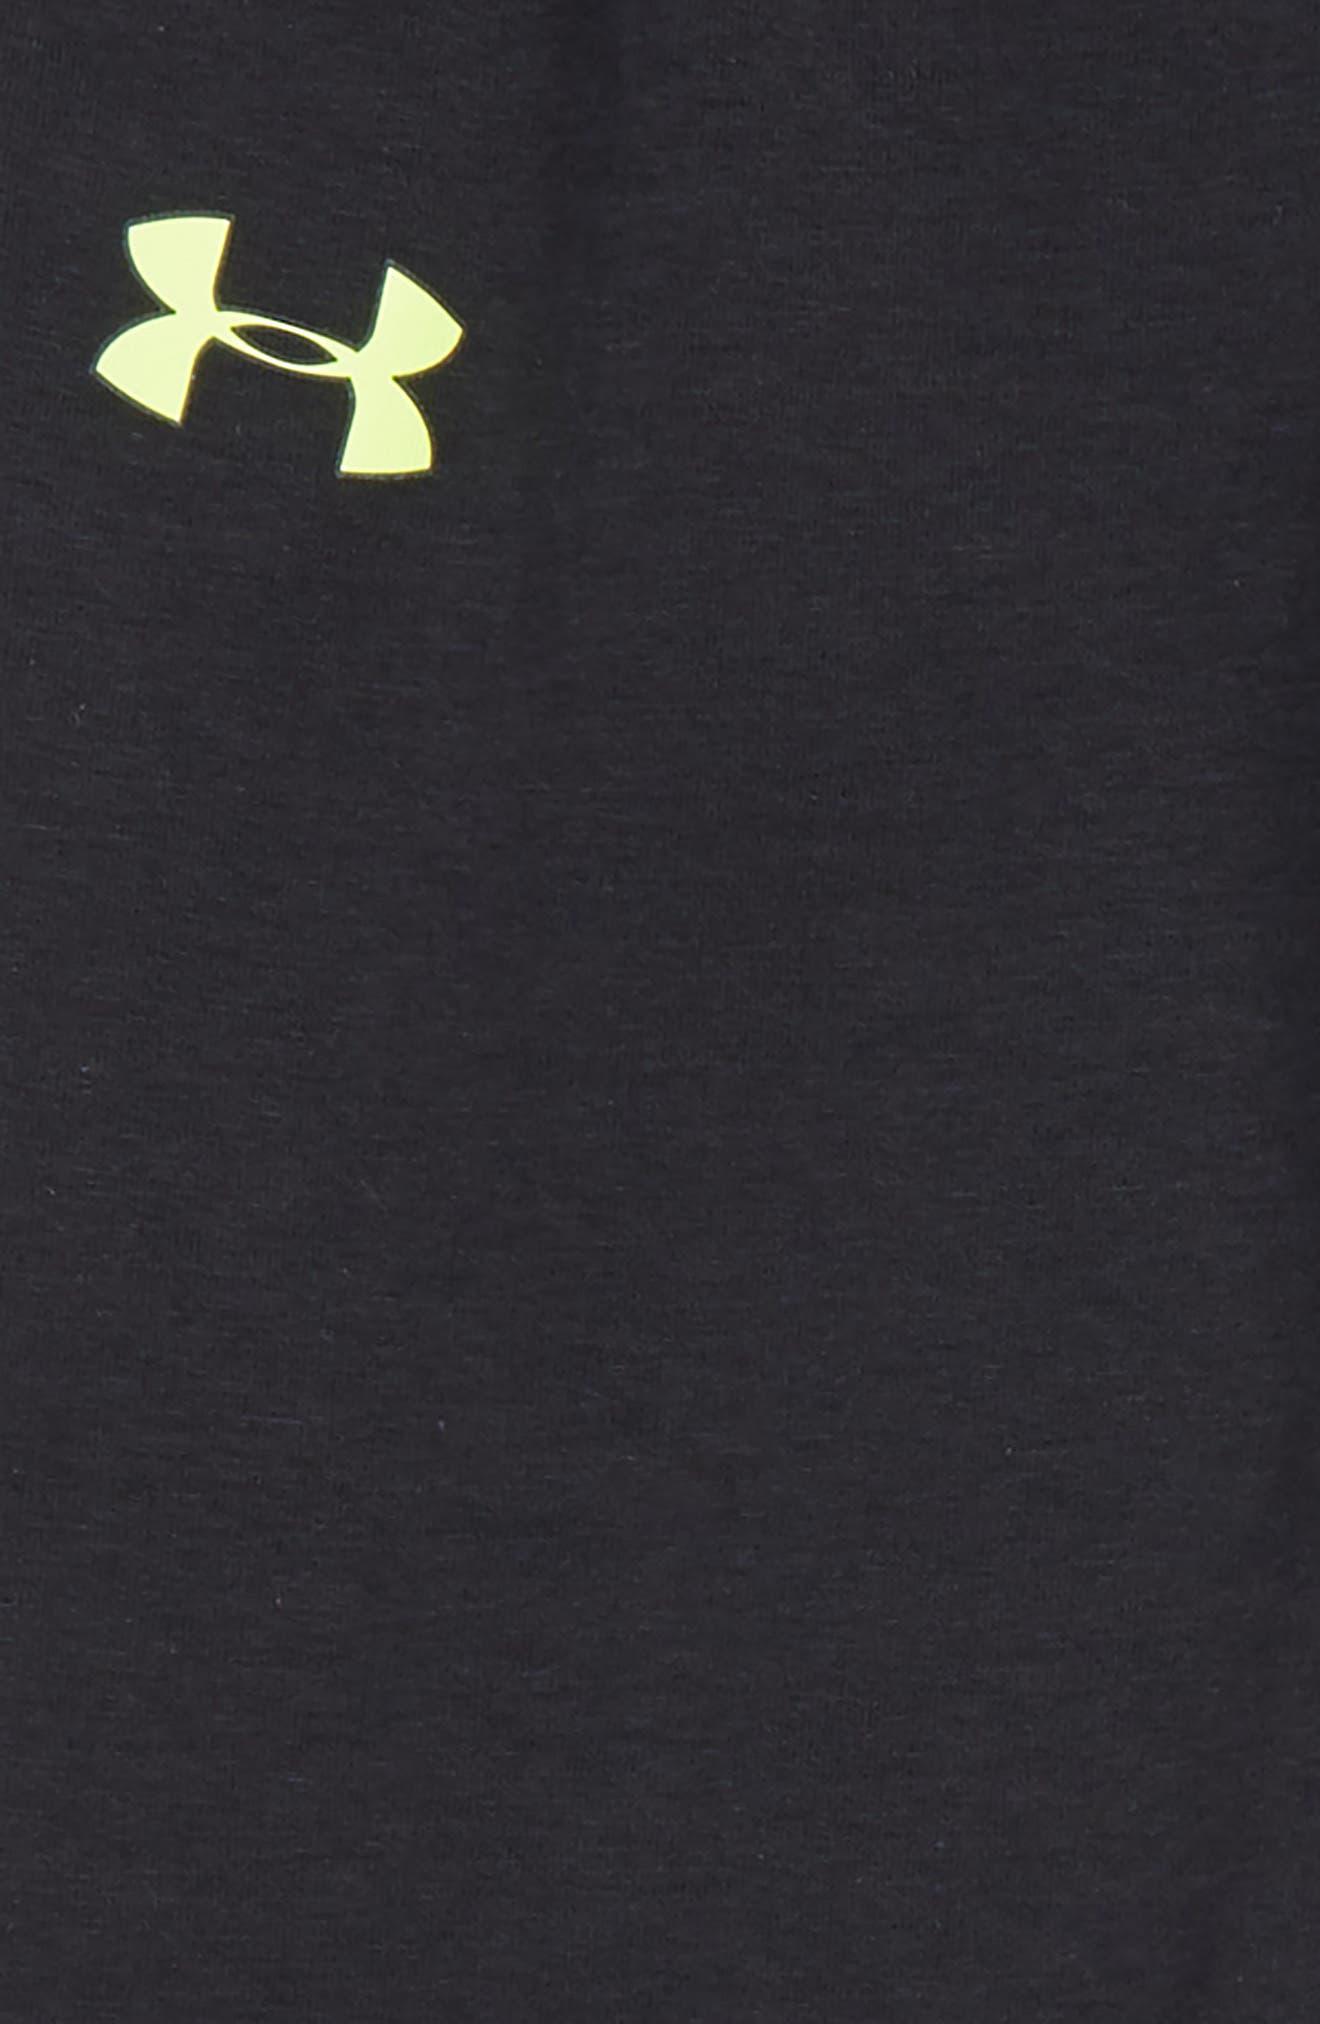 Double Knit Sweatpants,                             Alternate thumbnail 2, color,                             BLACK/ YELLOW